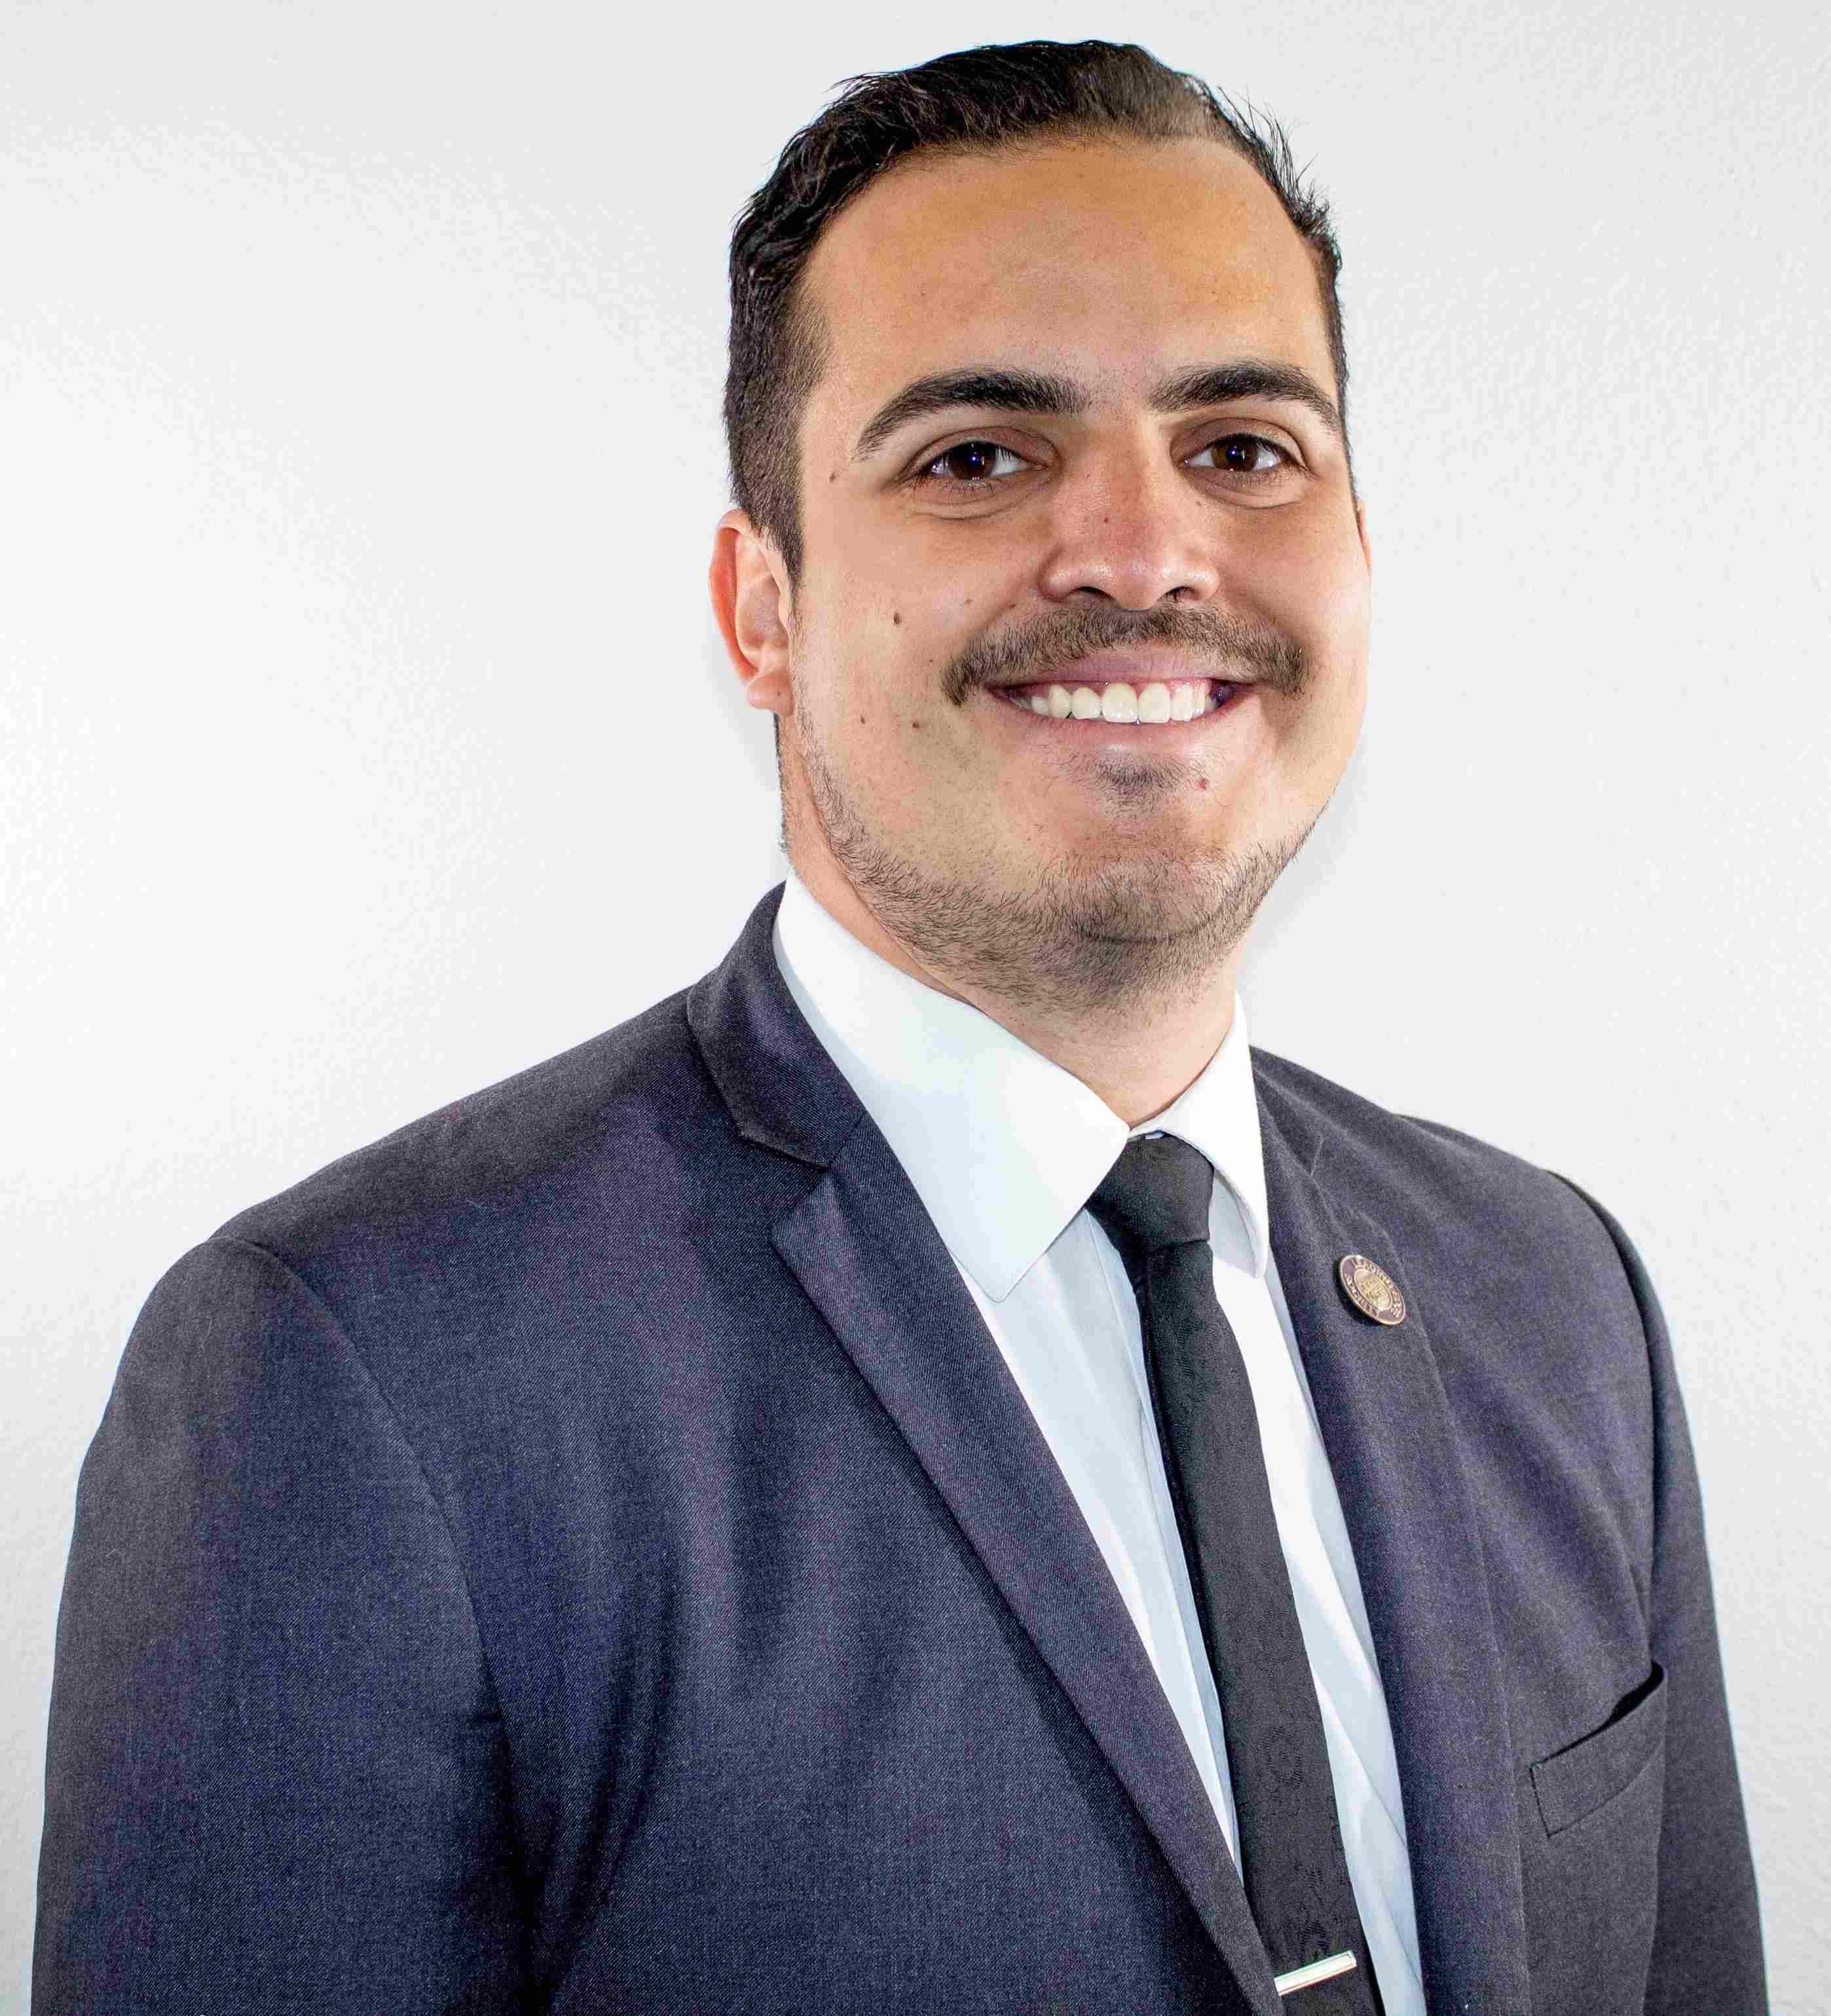 Ryan Lara